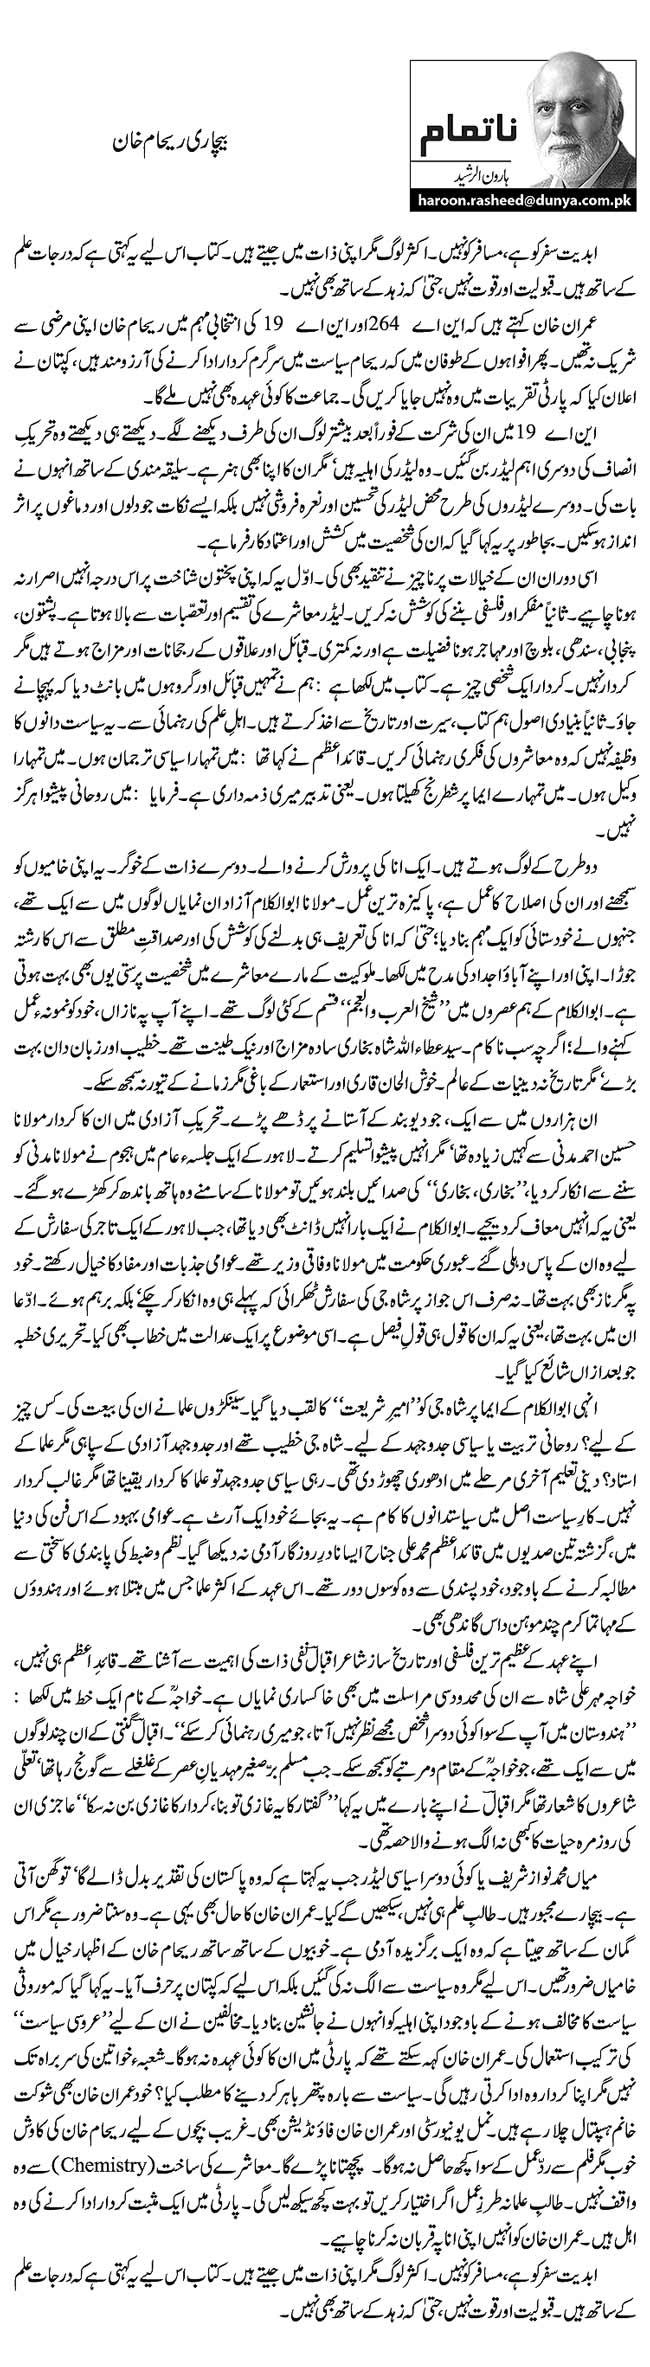 بیچاری ریحام خان